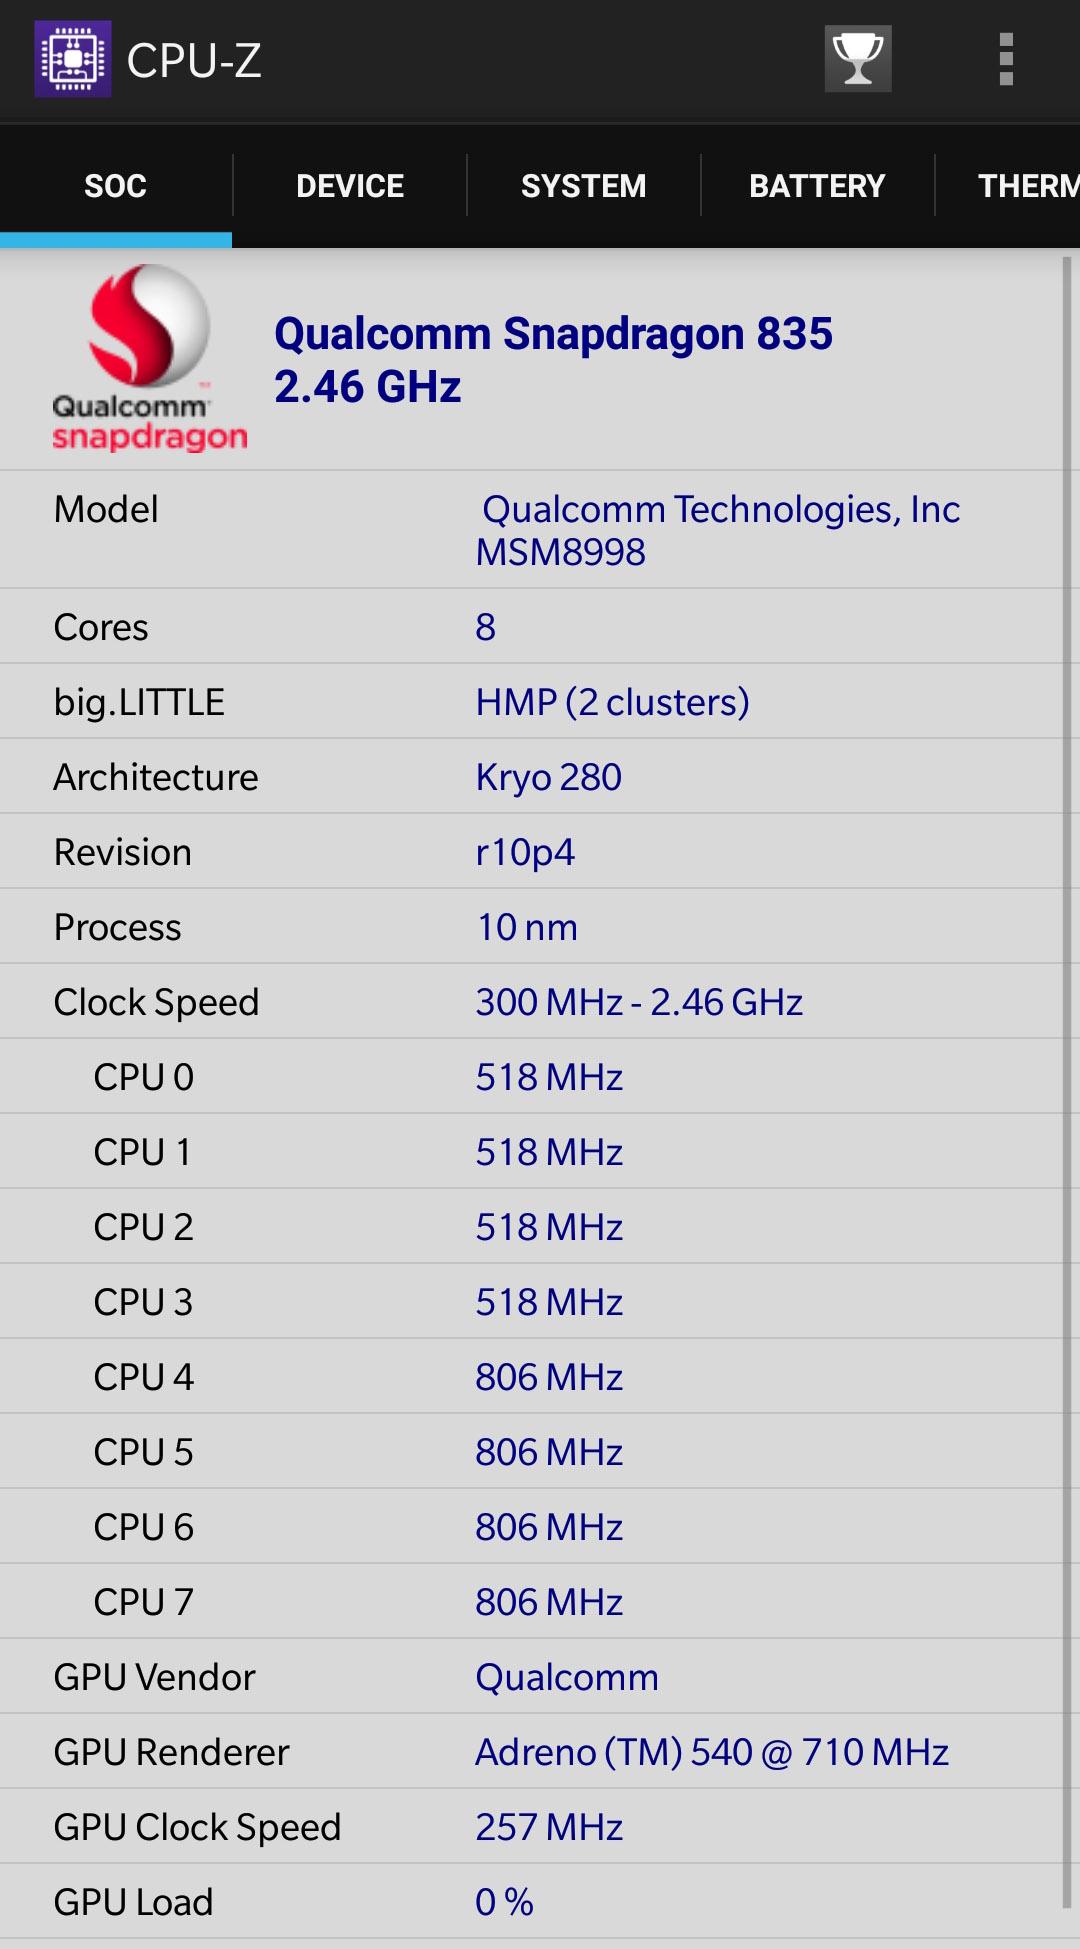 cpu-z-oneplus-5t-screenshots-1